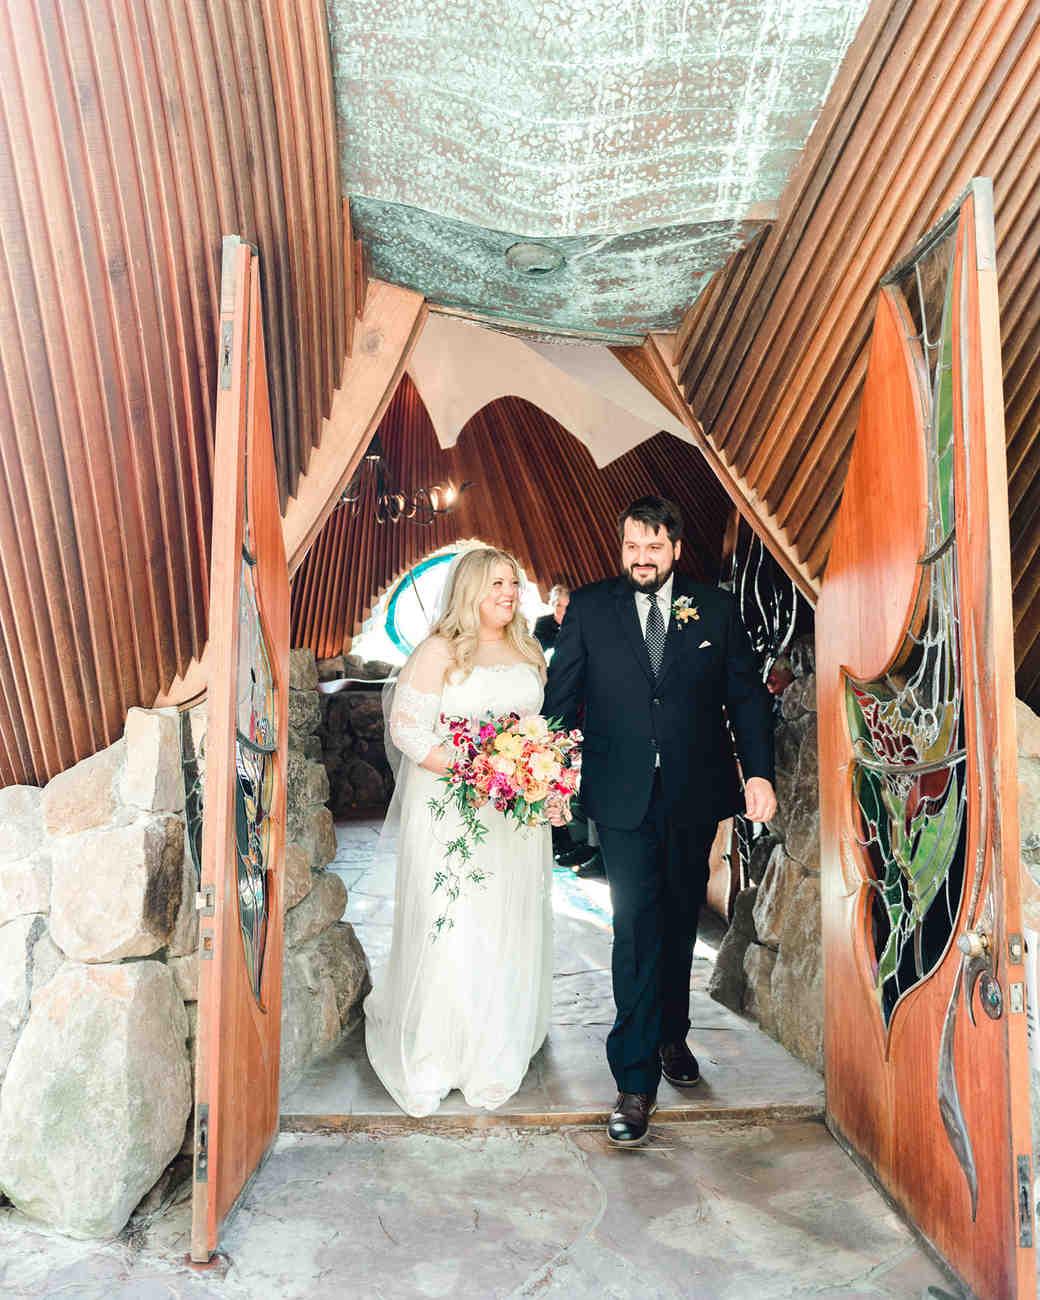 johanna erik wedding ceremony recessional